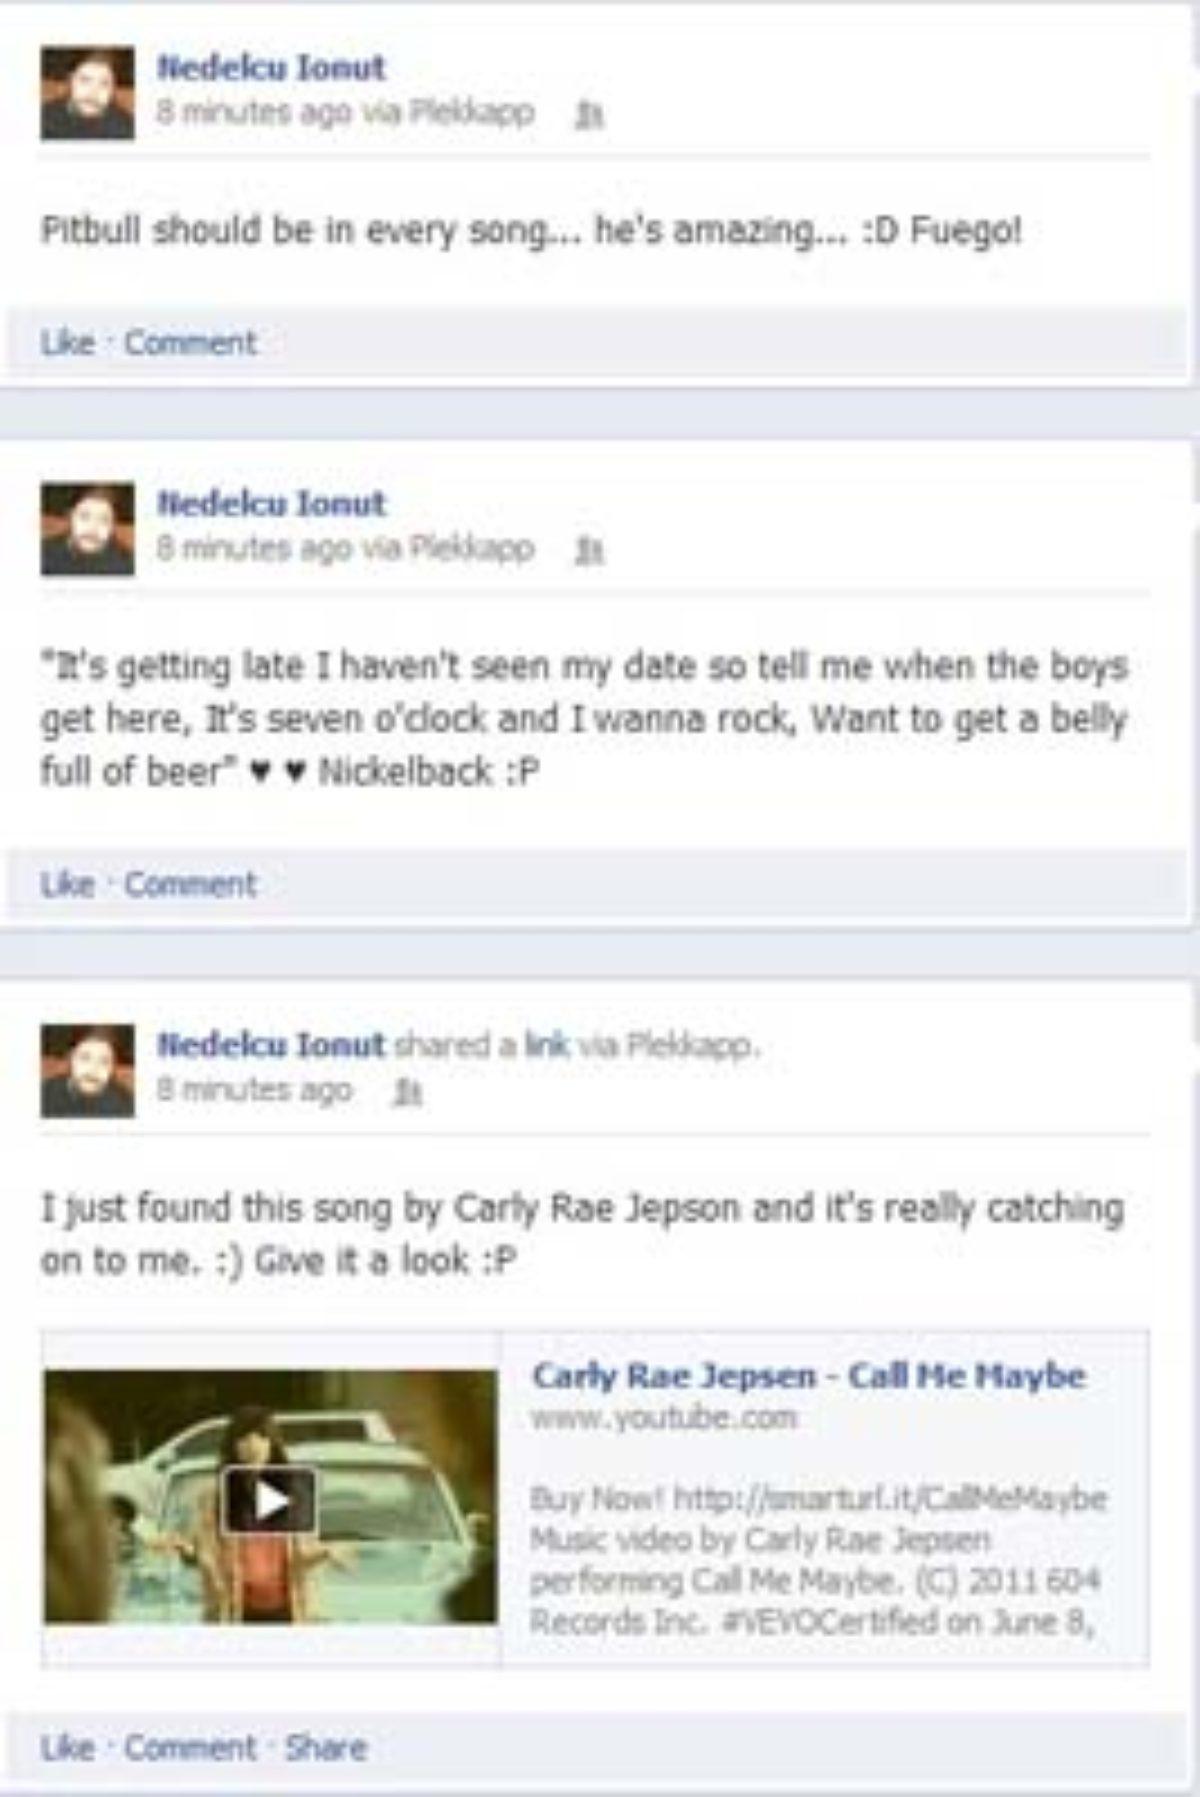 Funny Facebook Hacked Statuses : funny, facebook, hacked, statuses, Pretend, Hacked, Facebook, Application